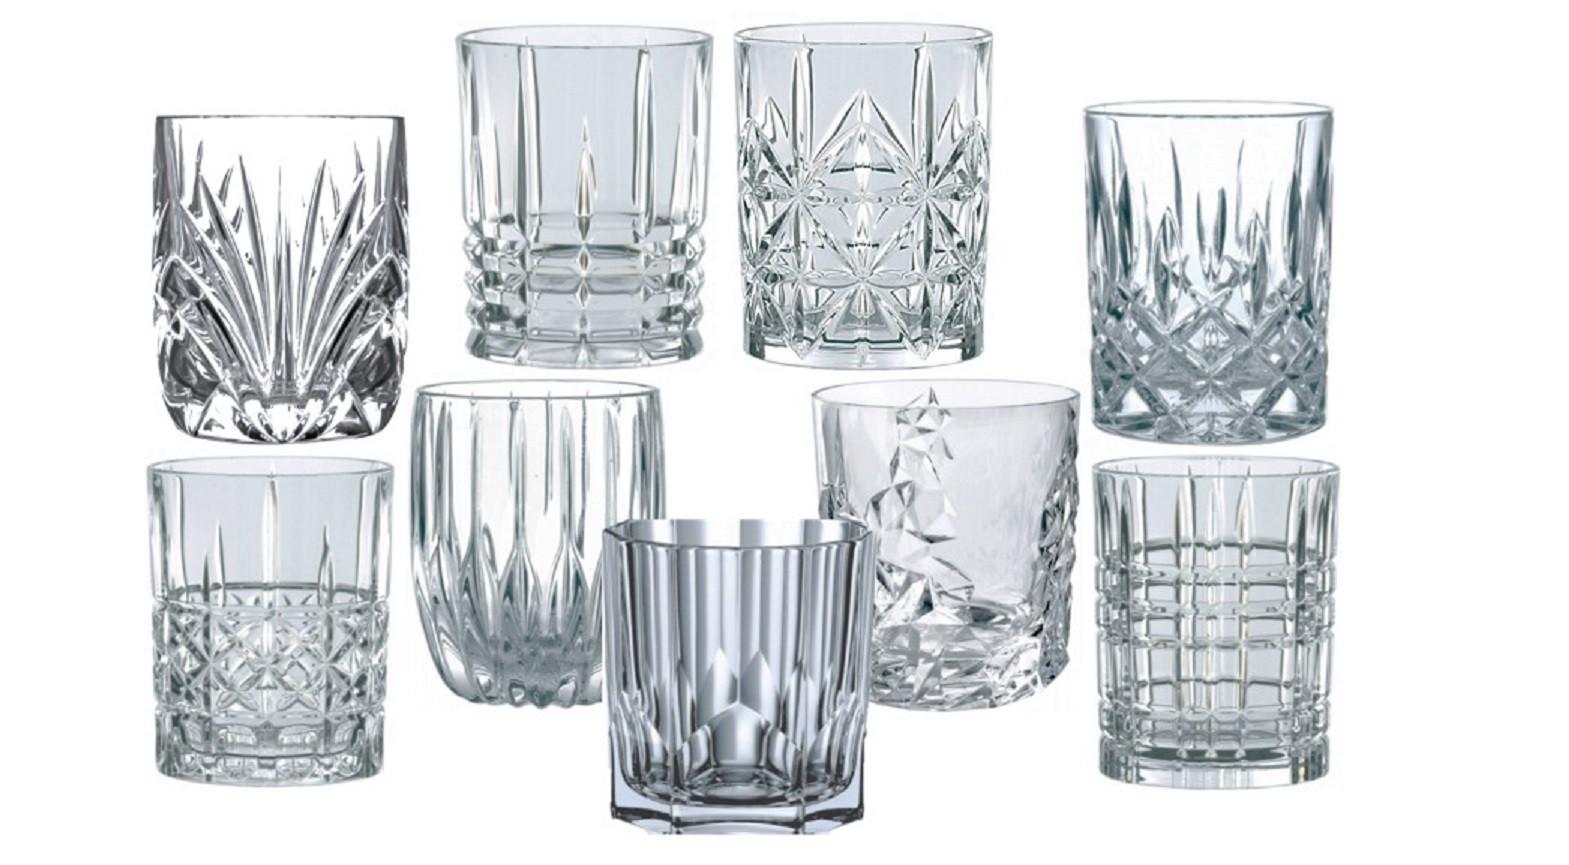 nachtmann-krystalglas-bland-selv-whisky-glas-lowball-tumbler-mixmeister.dk